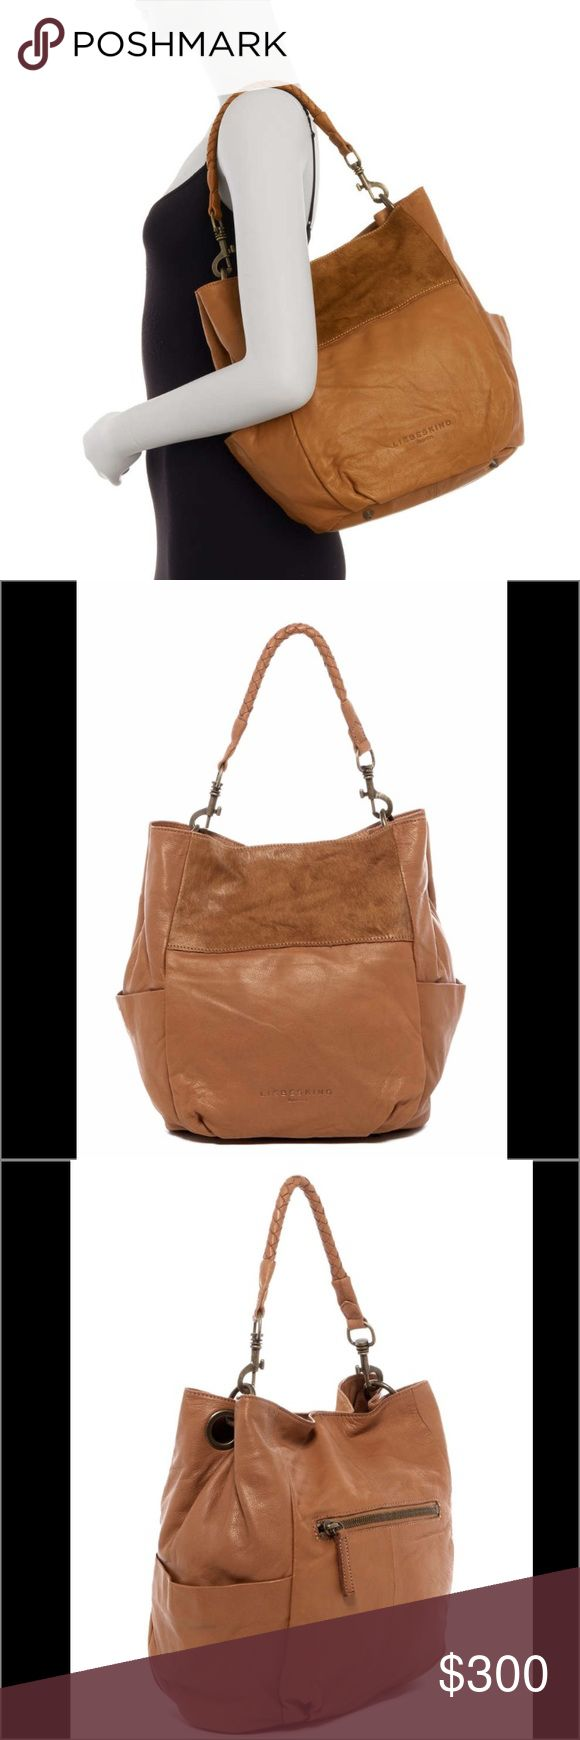 "Liebeskind Berlin Leather Shoulder Bag Liebeskind Berlin Leather with Genuine Calf Hair Bag.  NWT.  Detachable woven top handle with detachable, adjustable shoulder strap - Zip top closure - Exterior features back zip wall pocket and dual side slip pockets - Interior features zip wall pocket, slip wall pocket and 2 media pockets - Approx. 12"" H x 13.75"" W x 5.75"" D - Approx. 7"" handle drop, 19-23"" strap drop  Materials Light cognac (leather and genuine calf hair) Liebeskind Bags Shoulder…"